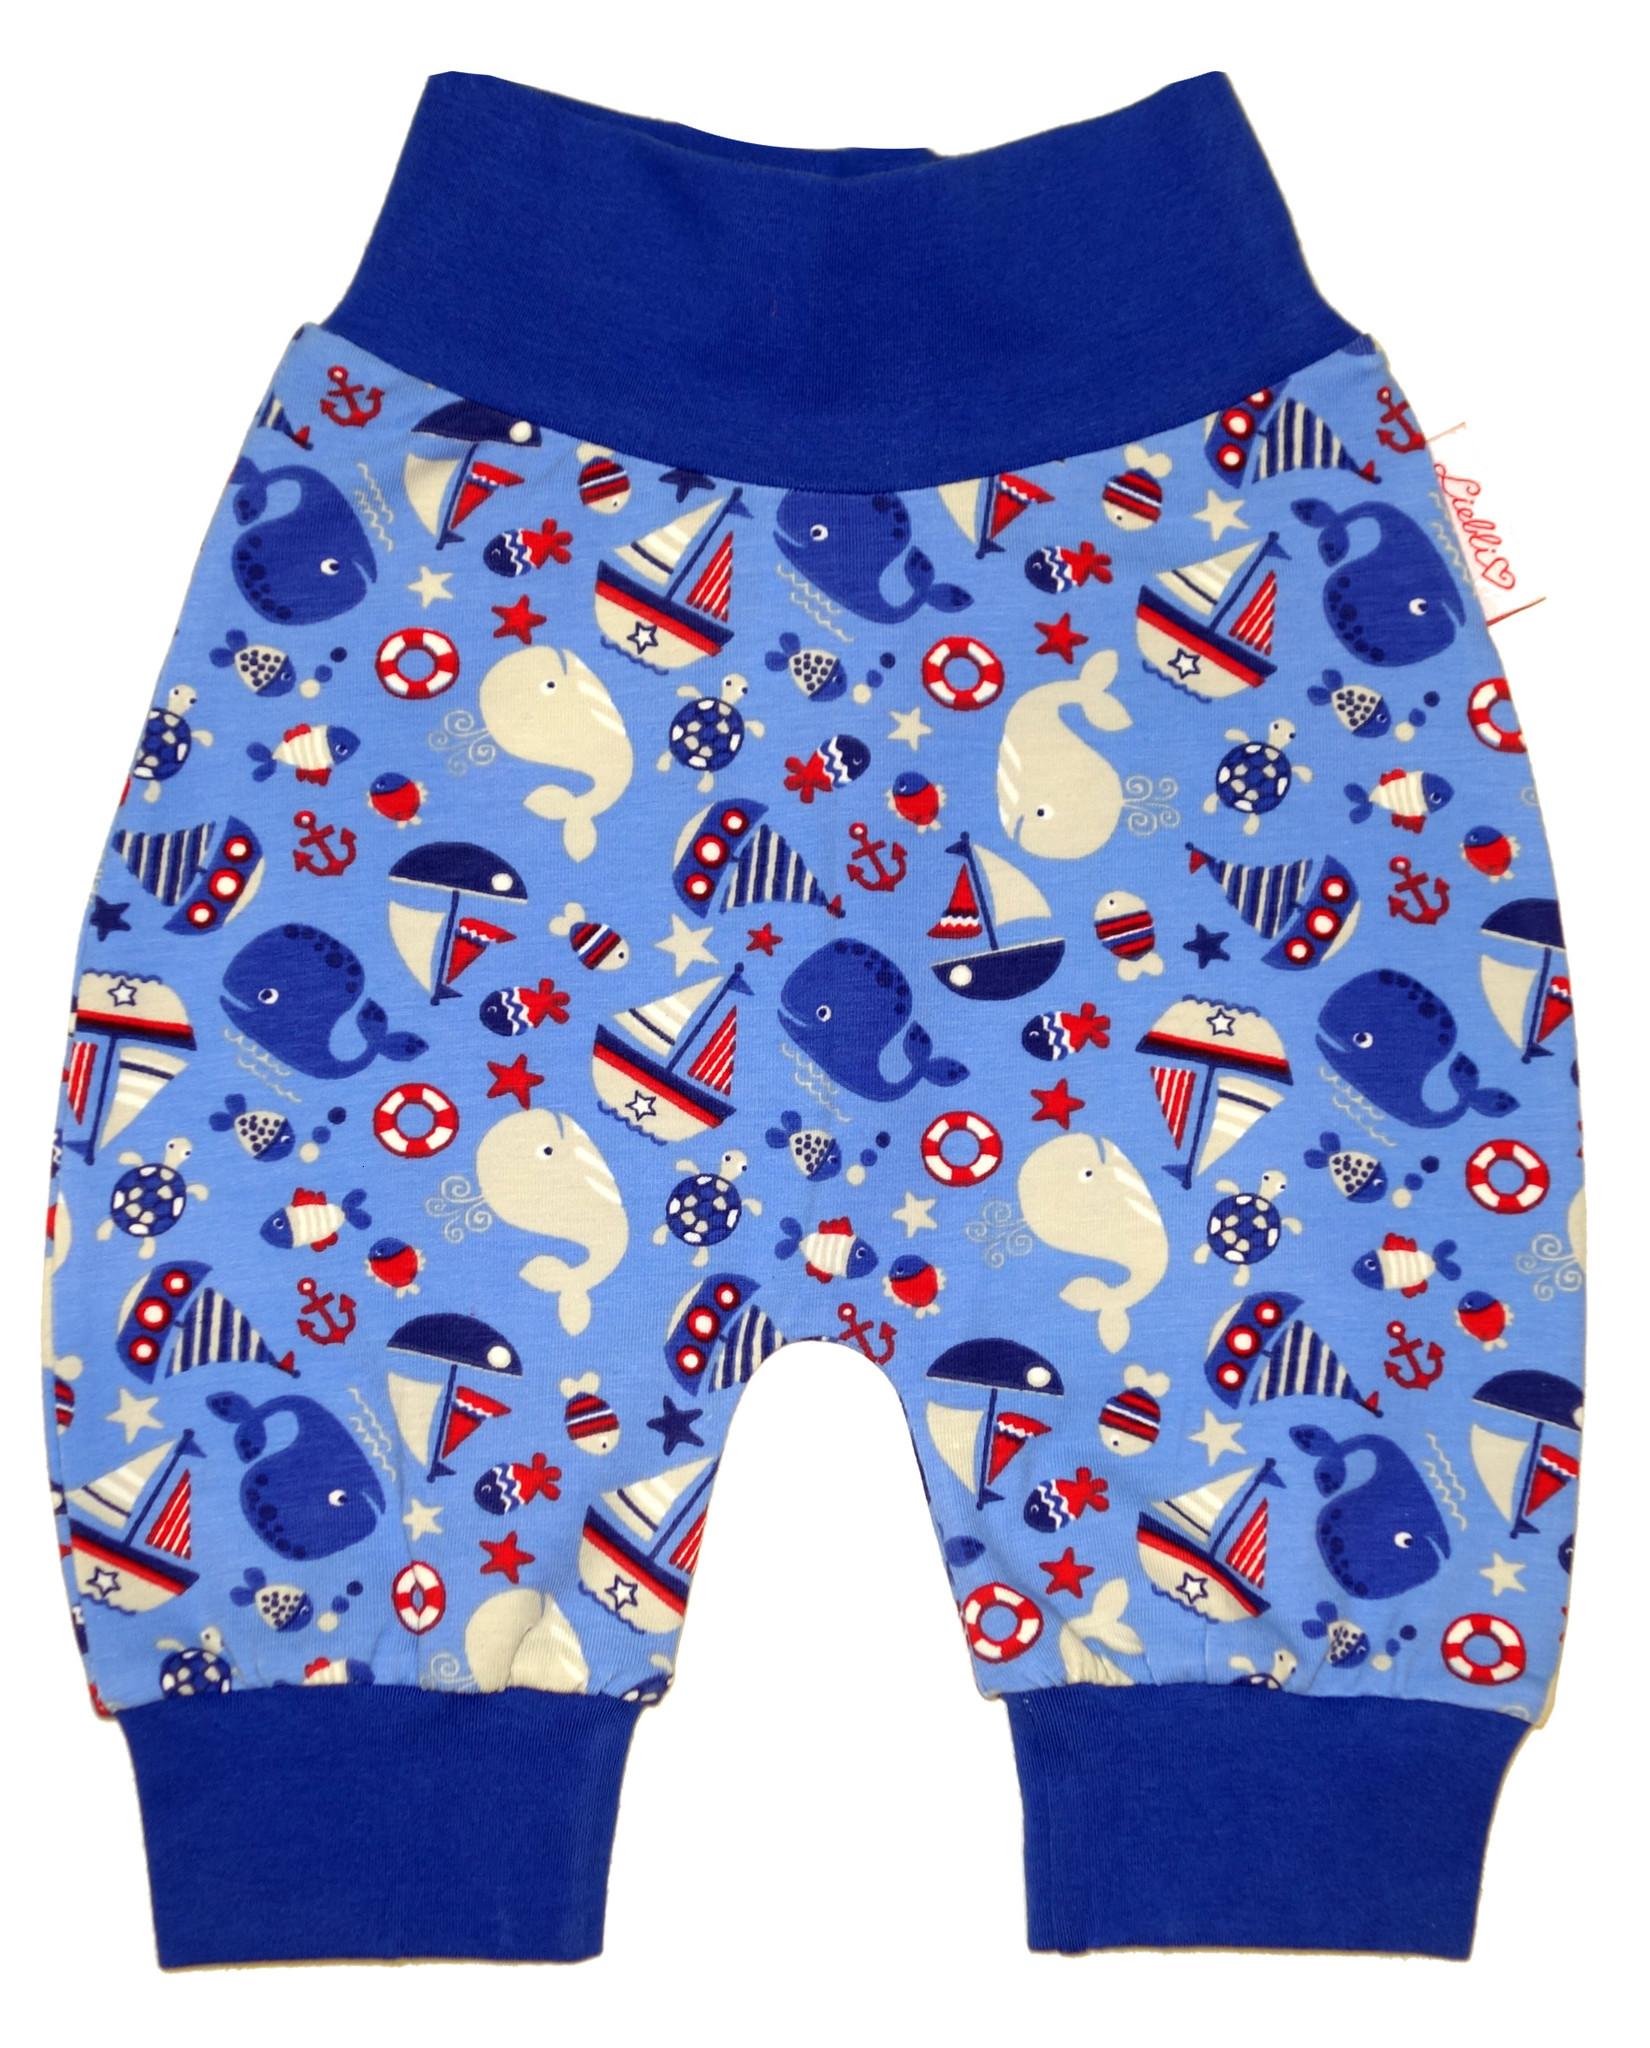 Babyhose / Pumphose, Wale und Schiffe blau